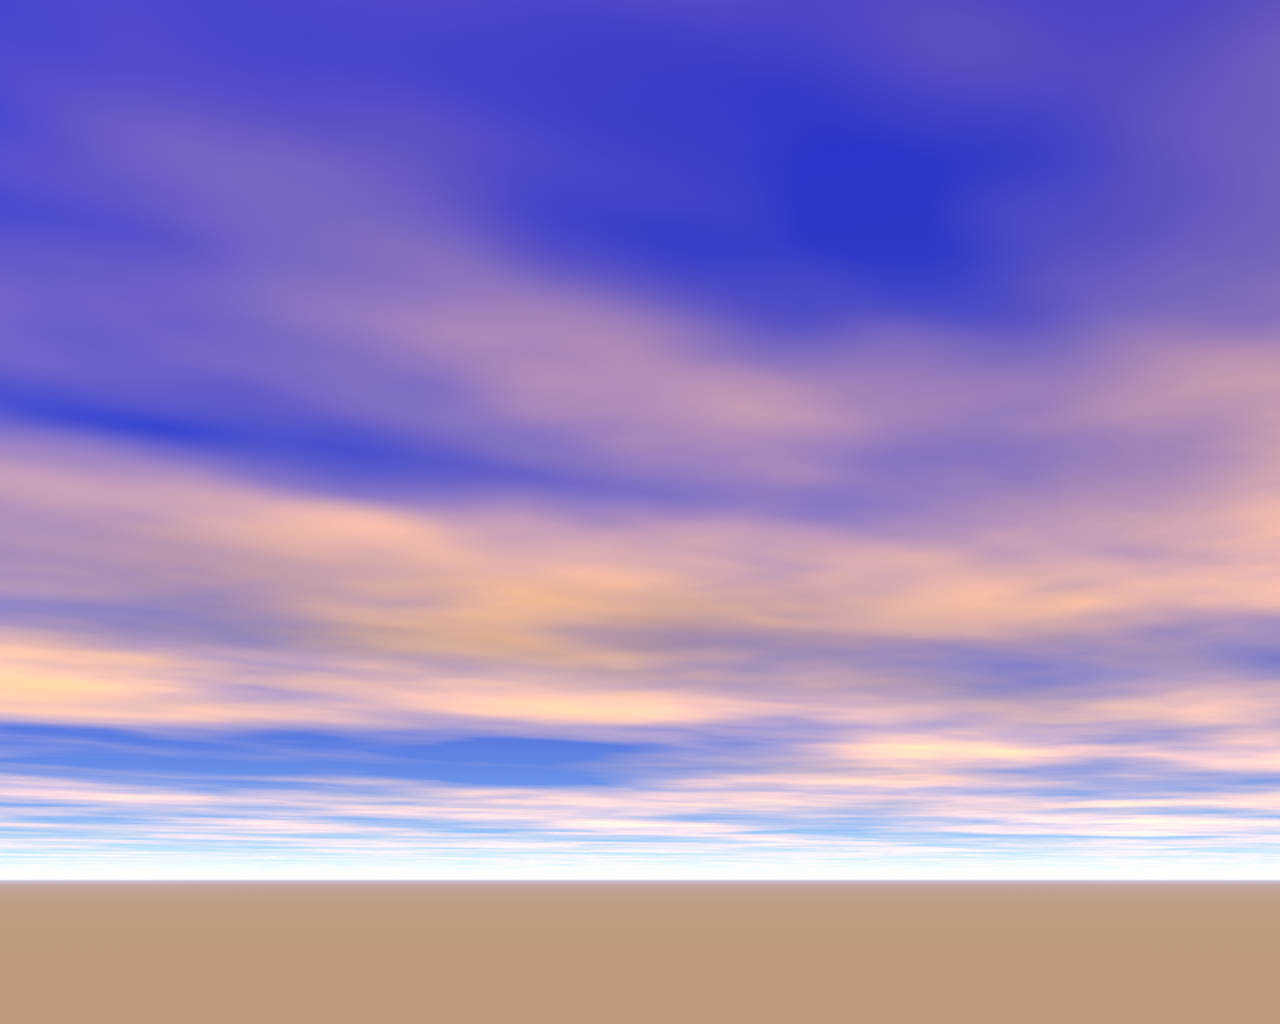 Sky Wallpapers: Free Wallpapers Blog: Sky Hd